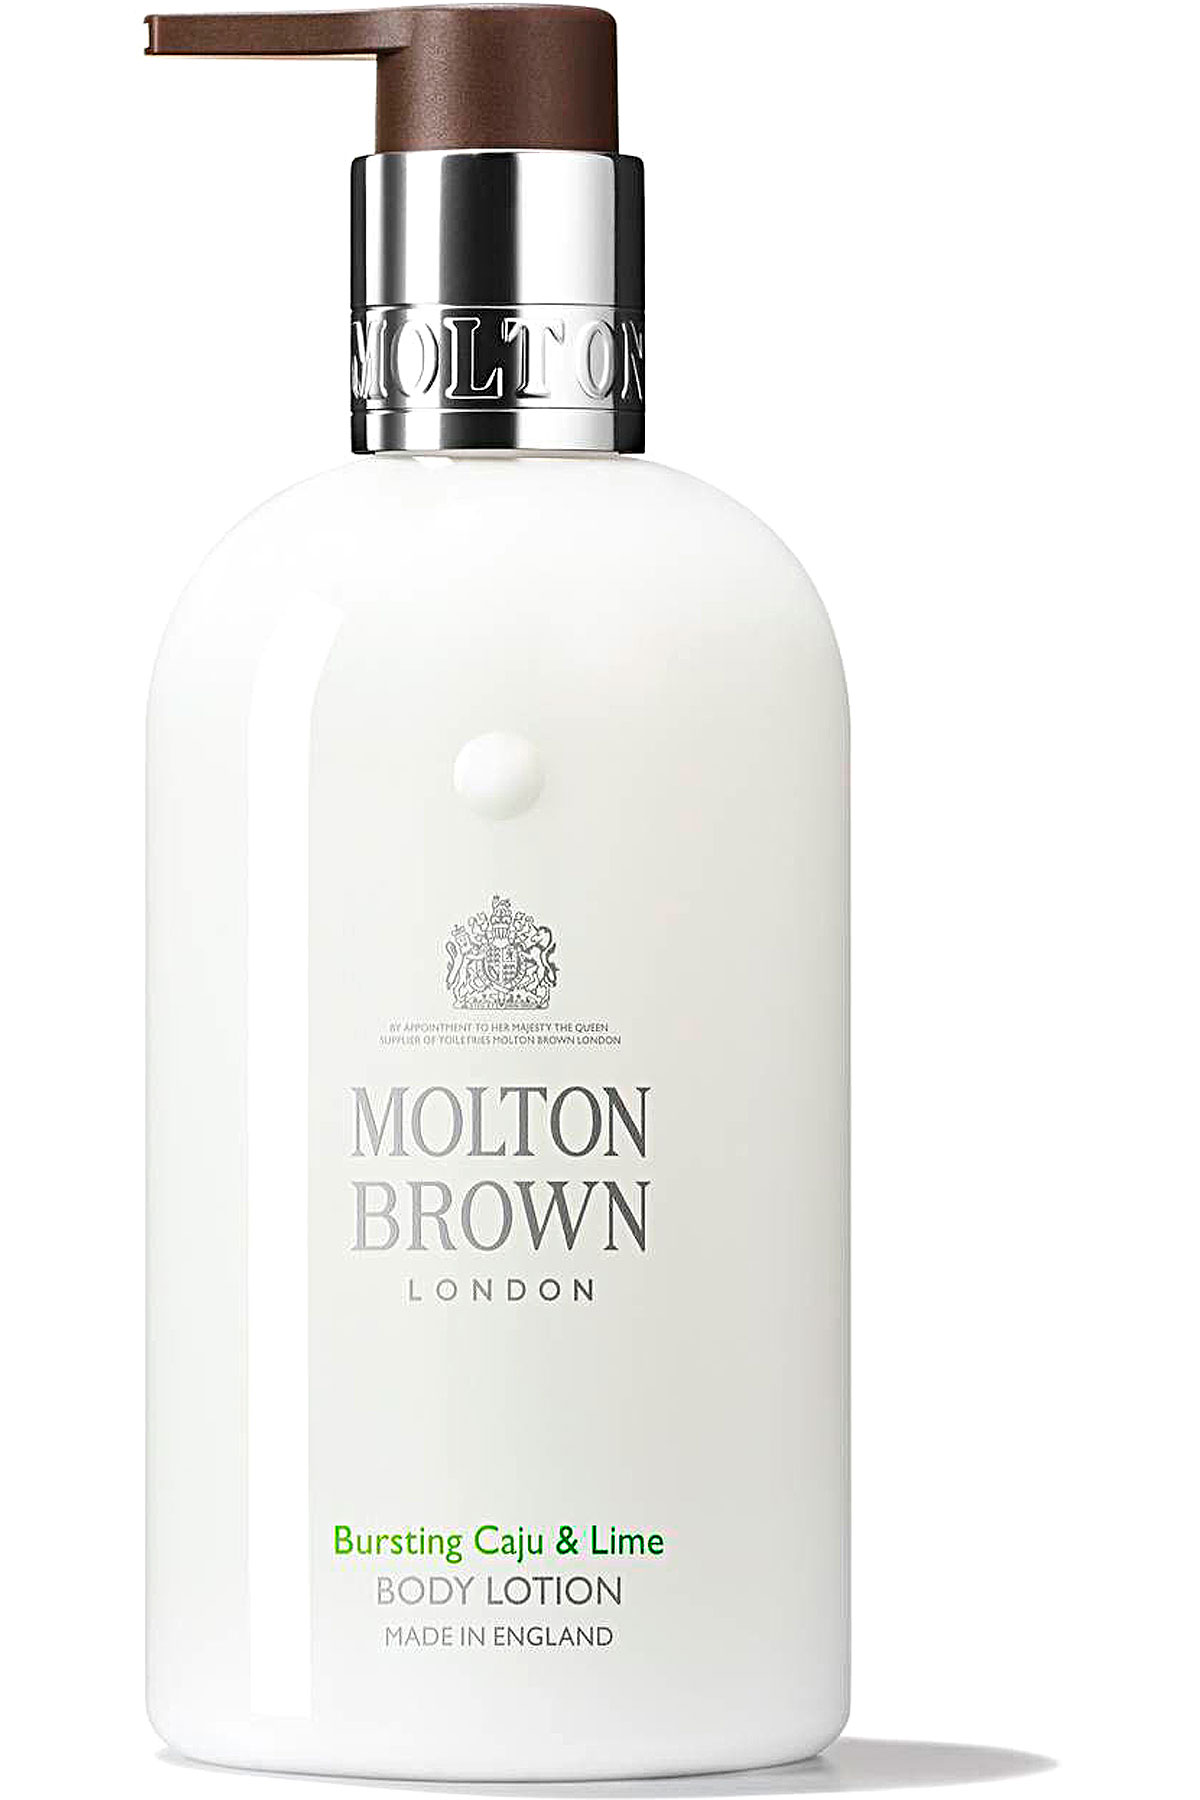 Molton Brown Beauty for Men, Bursting Caju & Lime - Body Lotion - 300 Ml, 2019, 300 ml